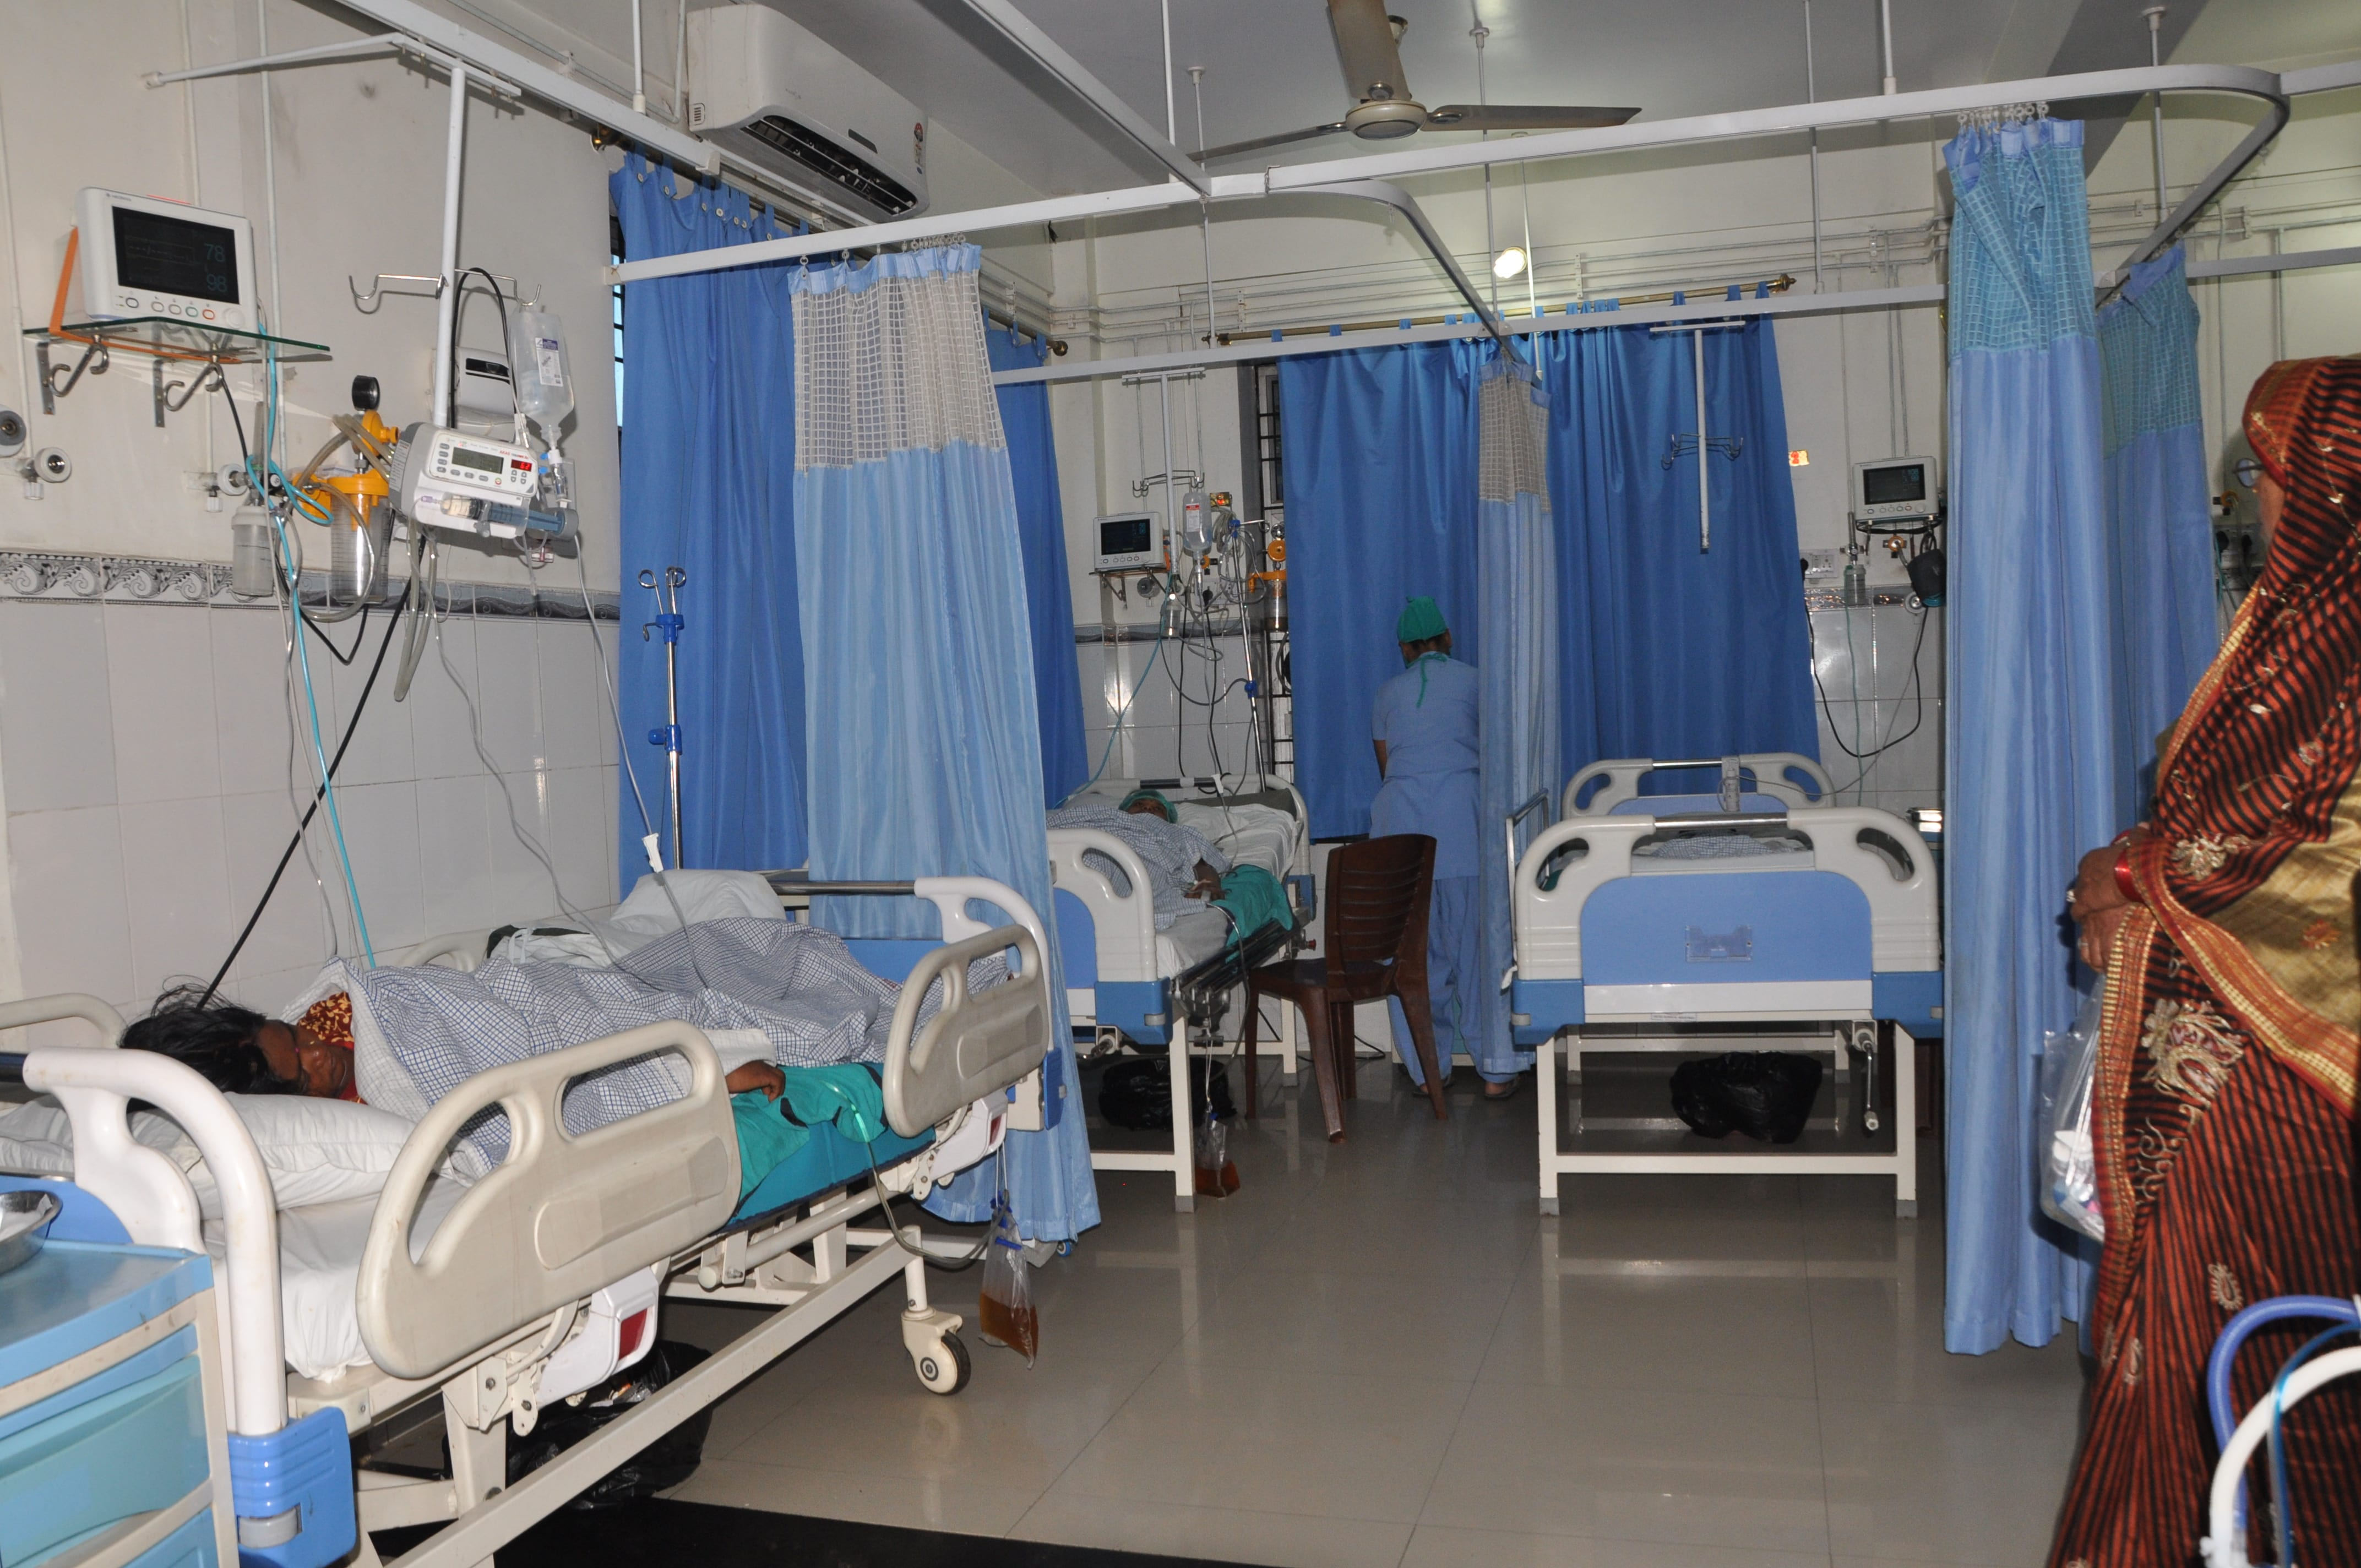 I.B Smriti Arogya Sadan - IVF Centre in Darbhanga